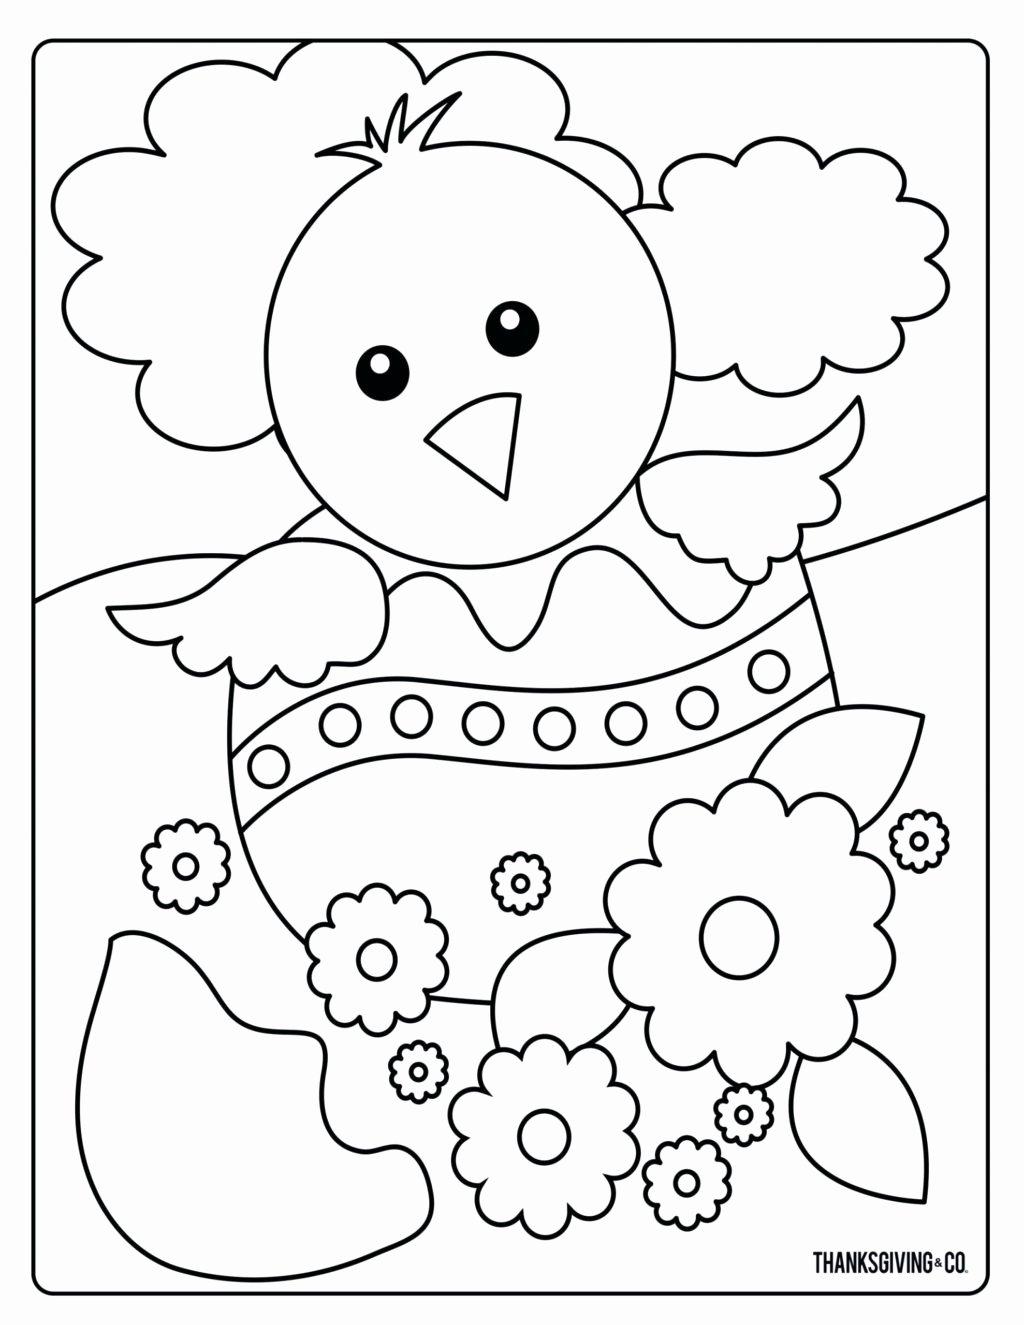 Art Worksheets for Preschoolers New Math Worksheet Coloringges Books forwtrol Art Worksheets